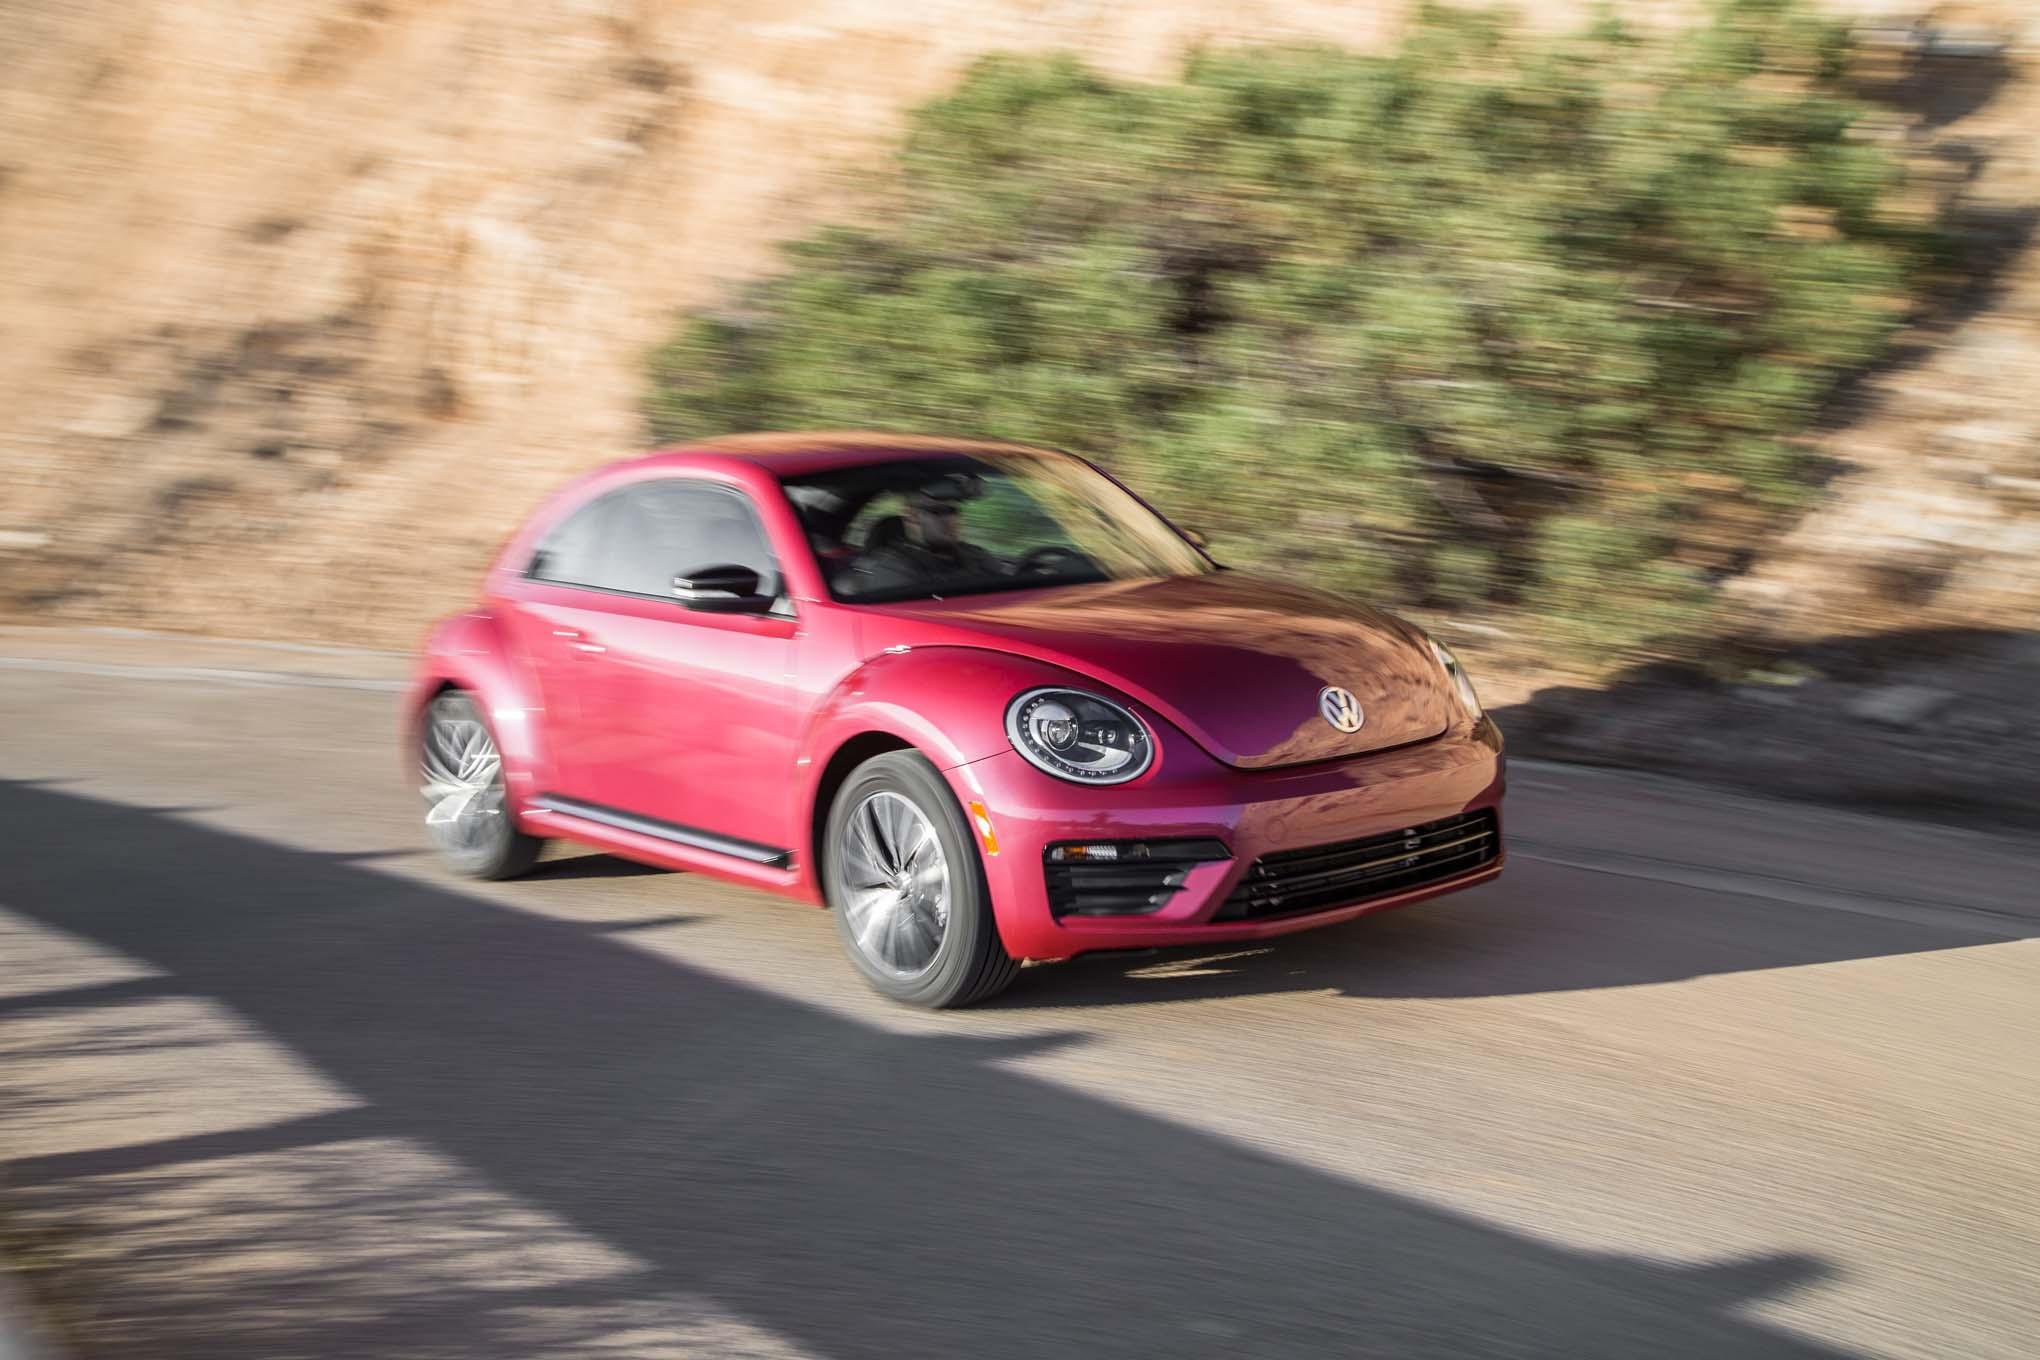 2017 Volkswagen PinkBeetle front three quarter in motion 02